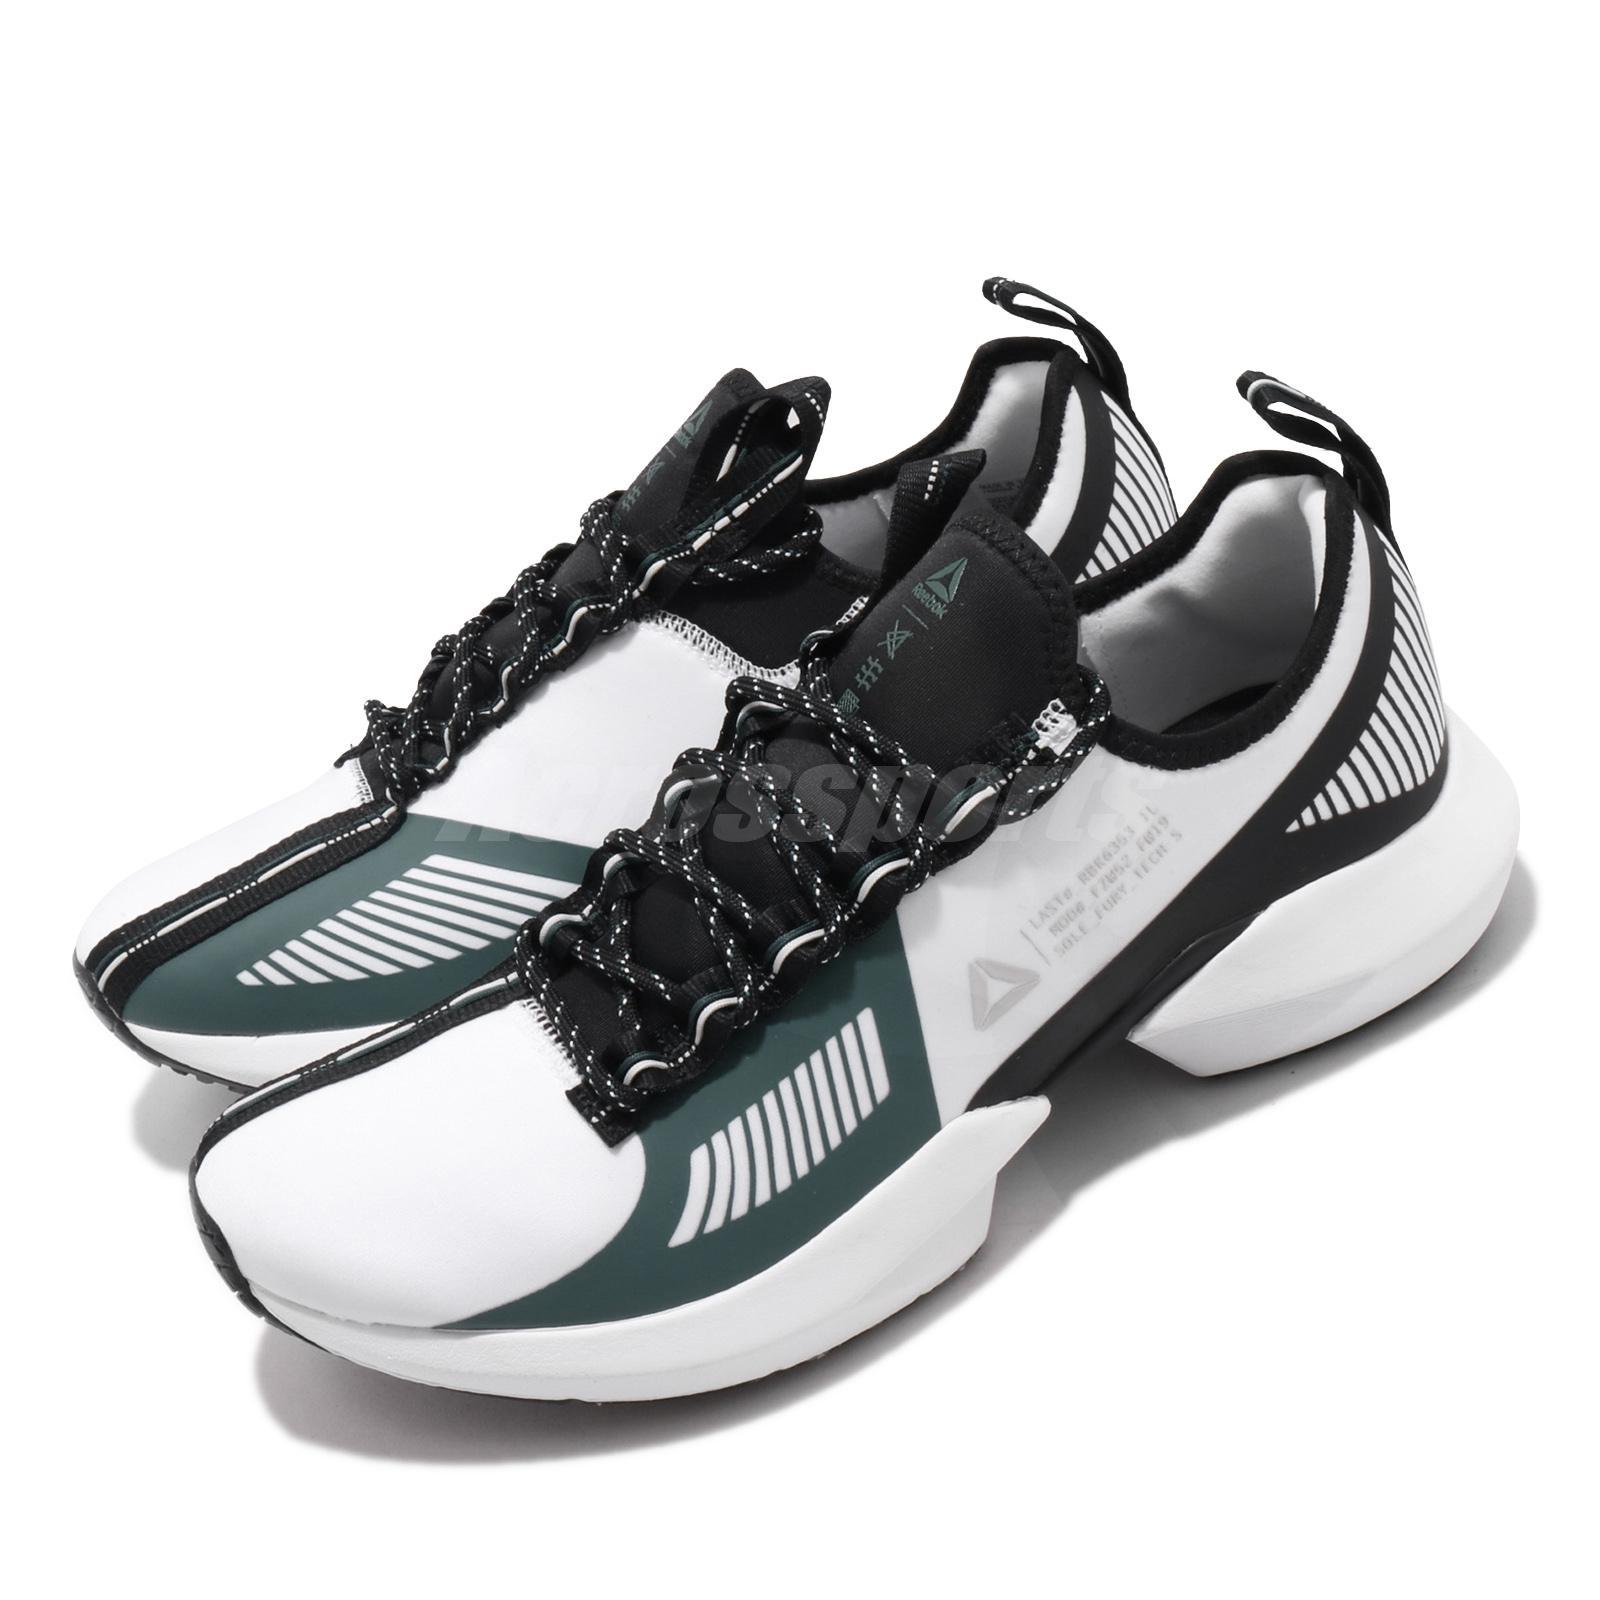 Reebok Sole Fury TS White Black Clover Green Men Running Shoes Sneakers DV9286